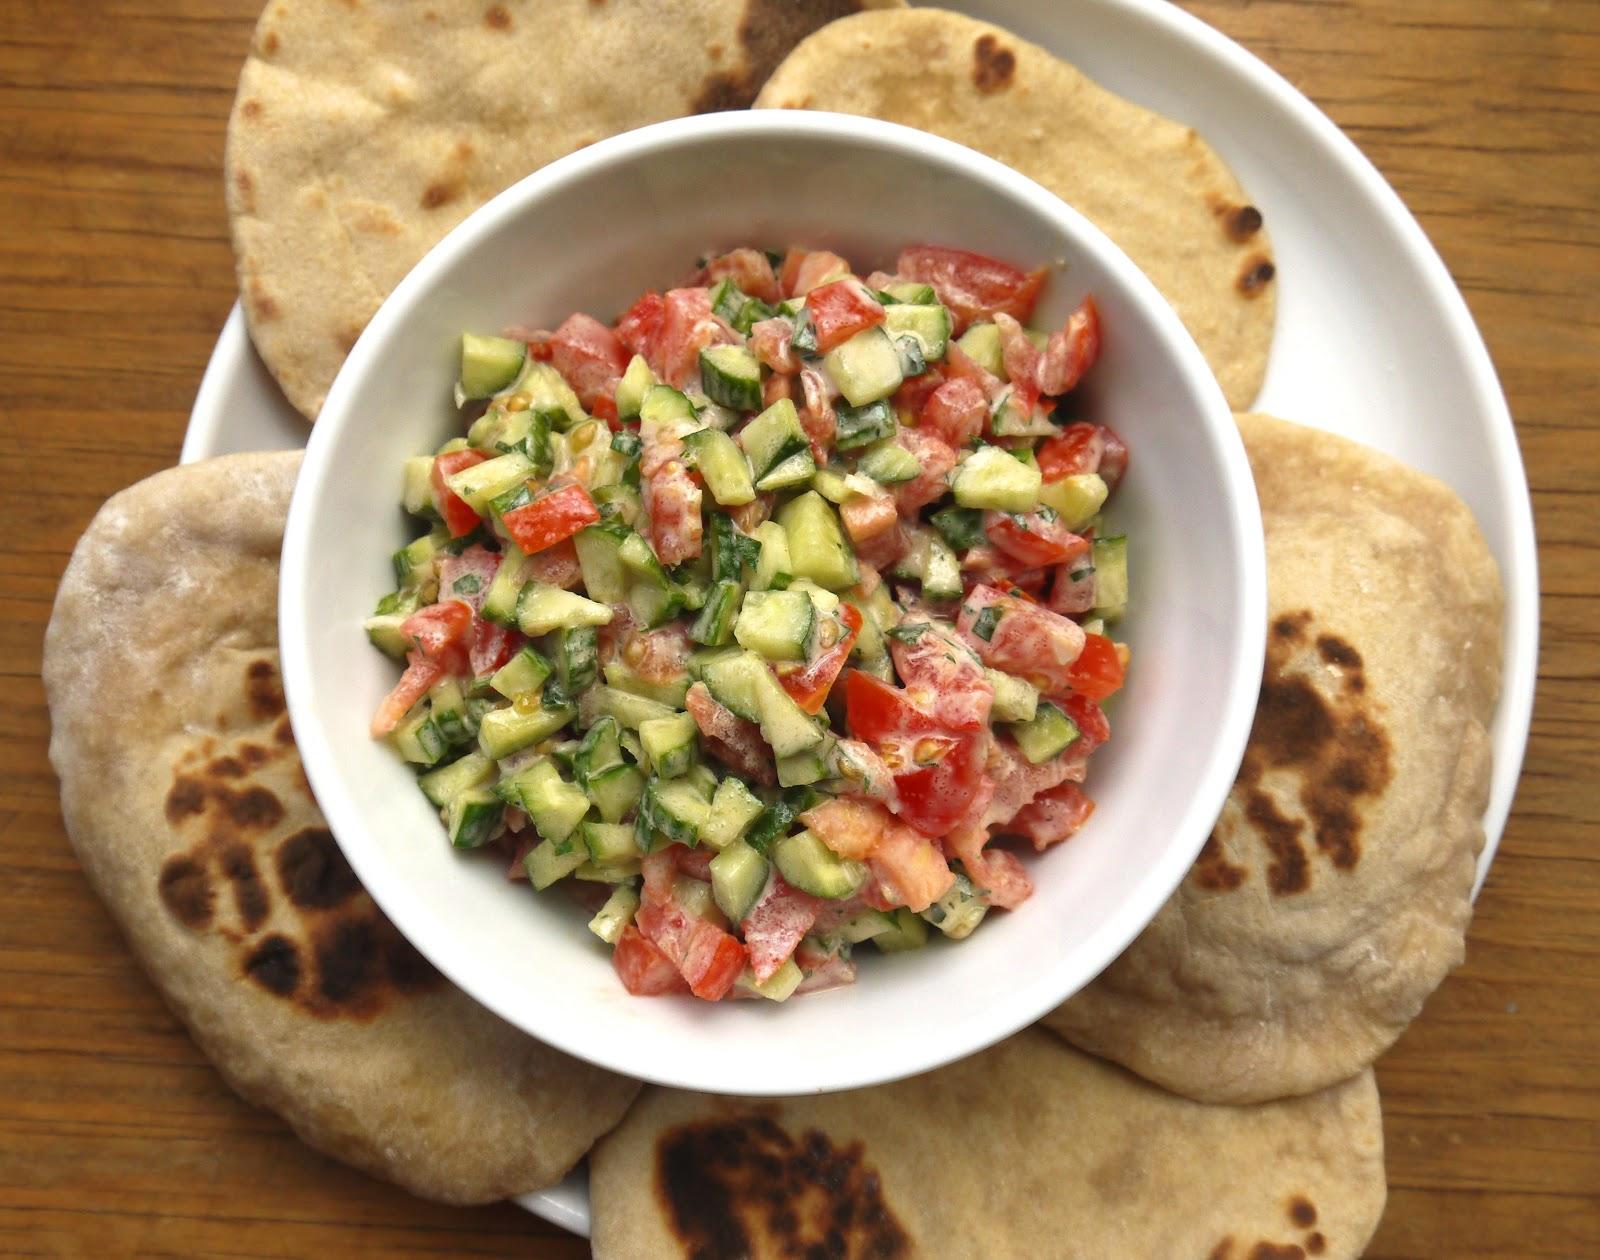 Bint Rhoda's Kitchen: Cucumber-Tomato Salad with Tahini-Lemon Dressing